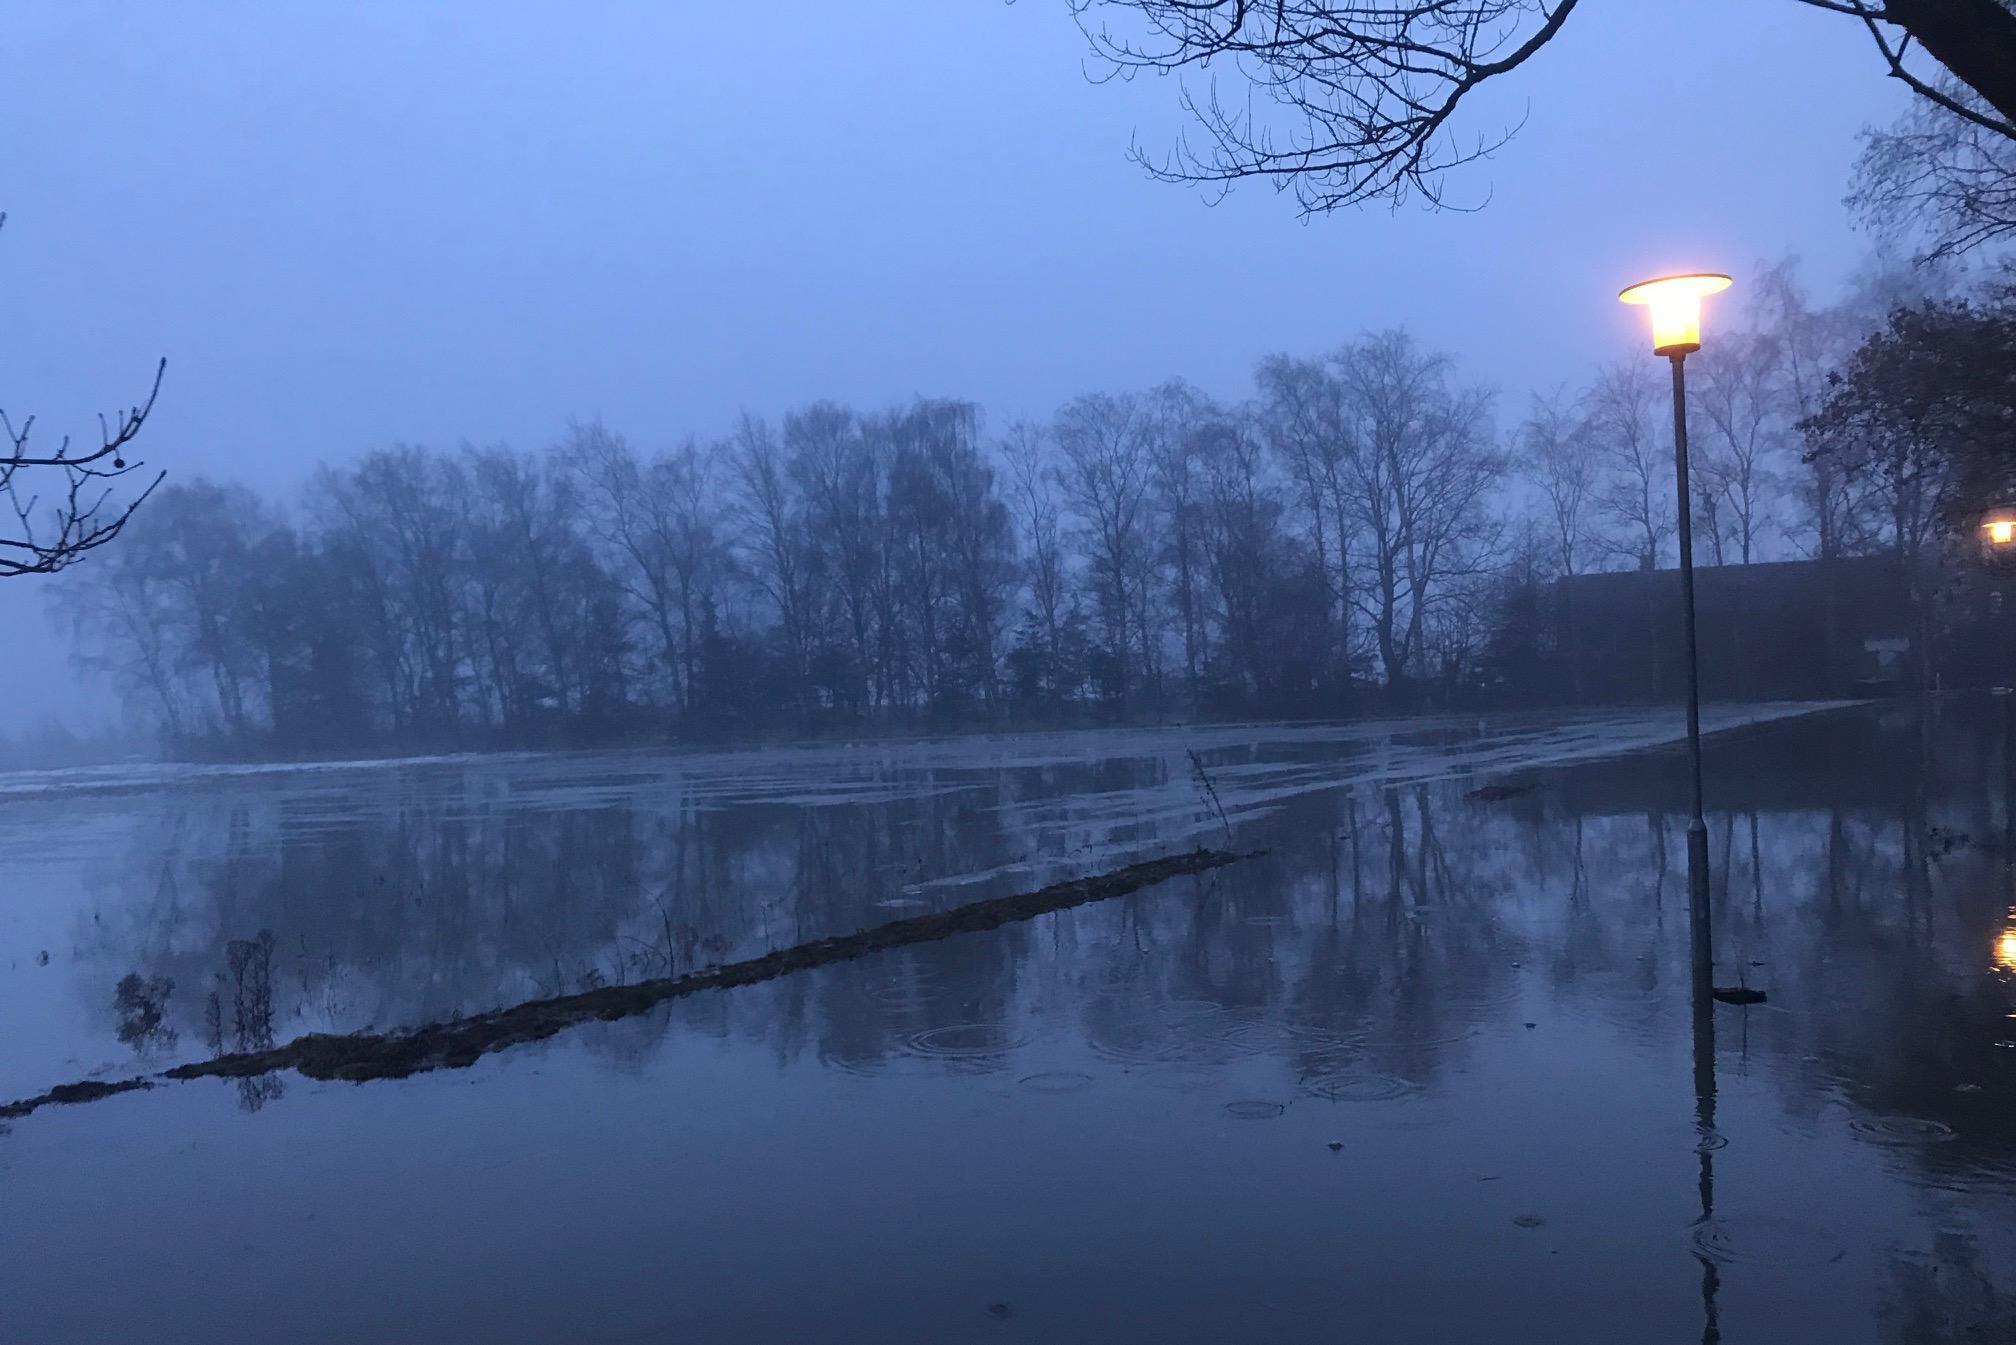 foto_henrik_boege_jensen_lundby_9.png.jpg